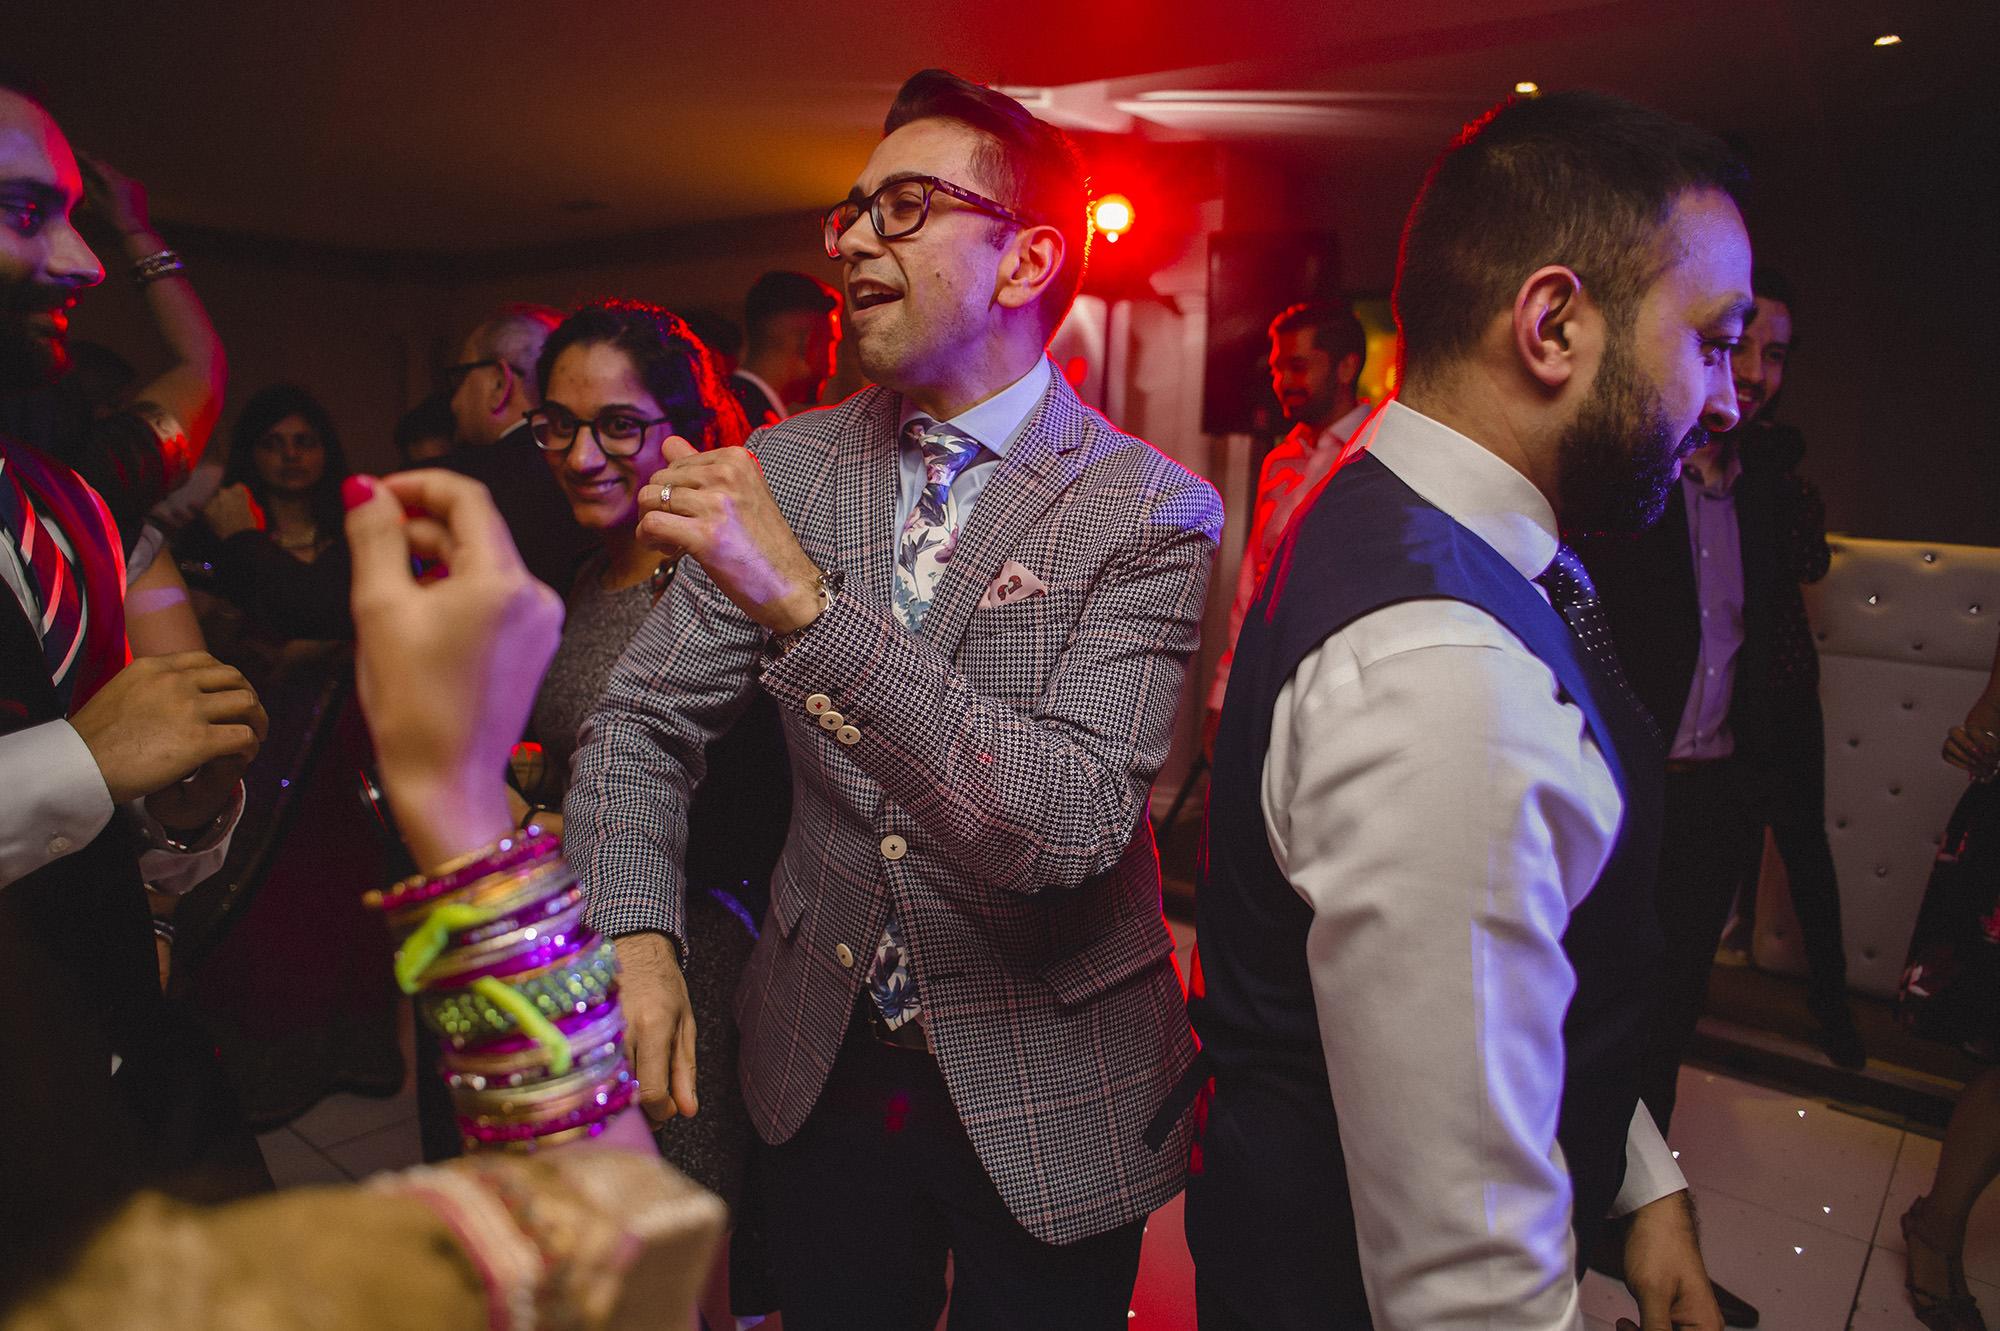 wedding guest dancing at wedding reception